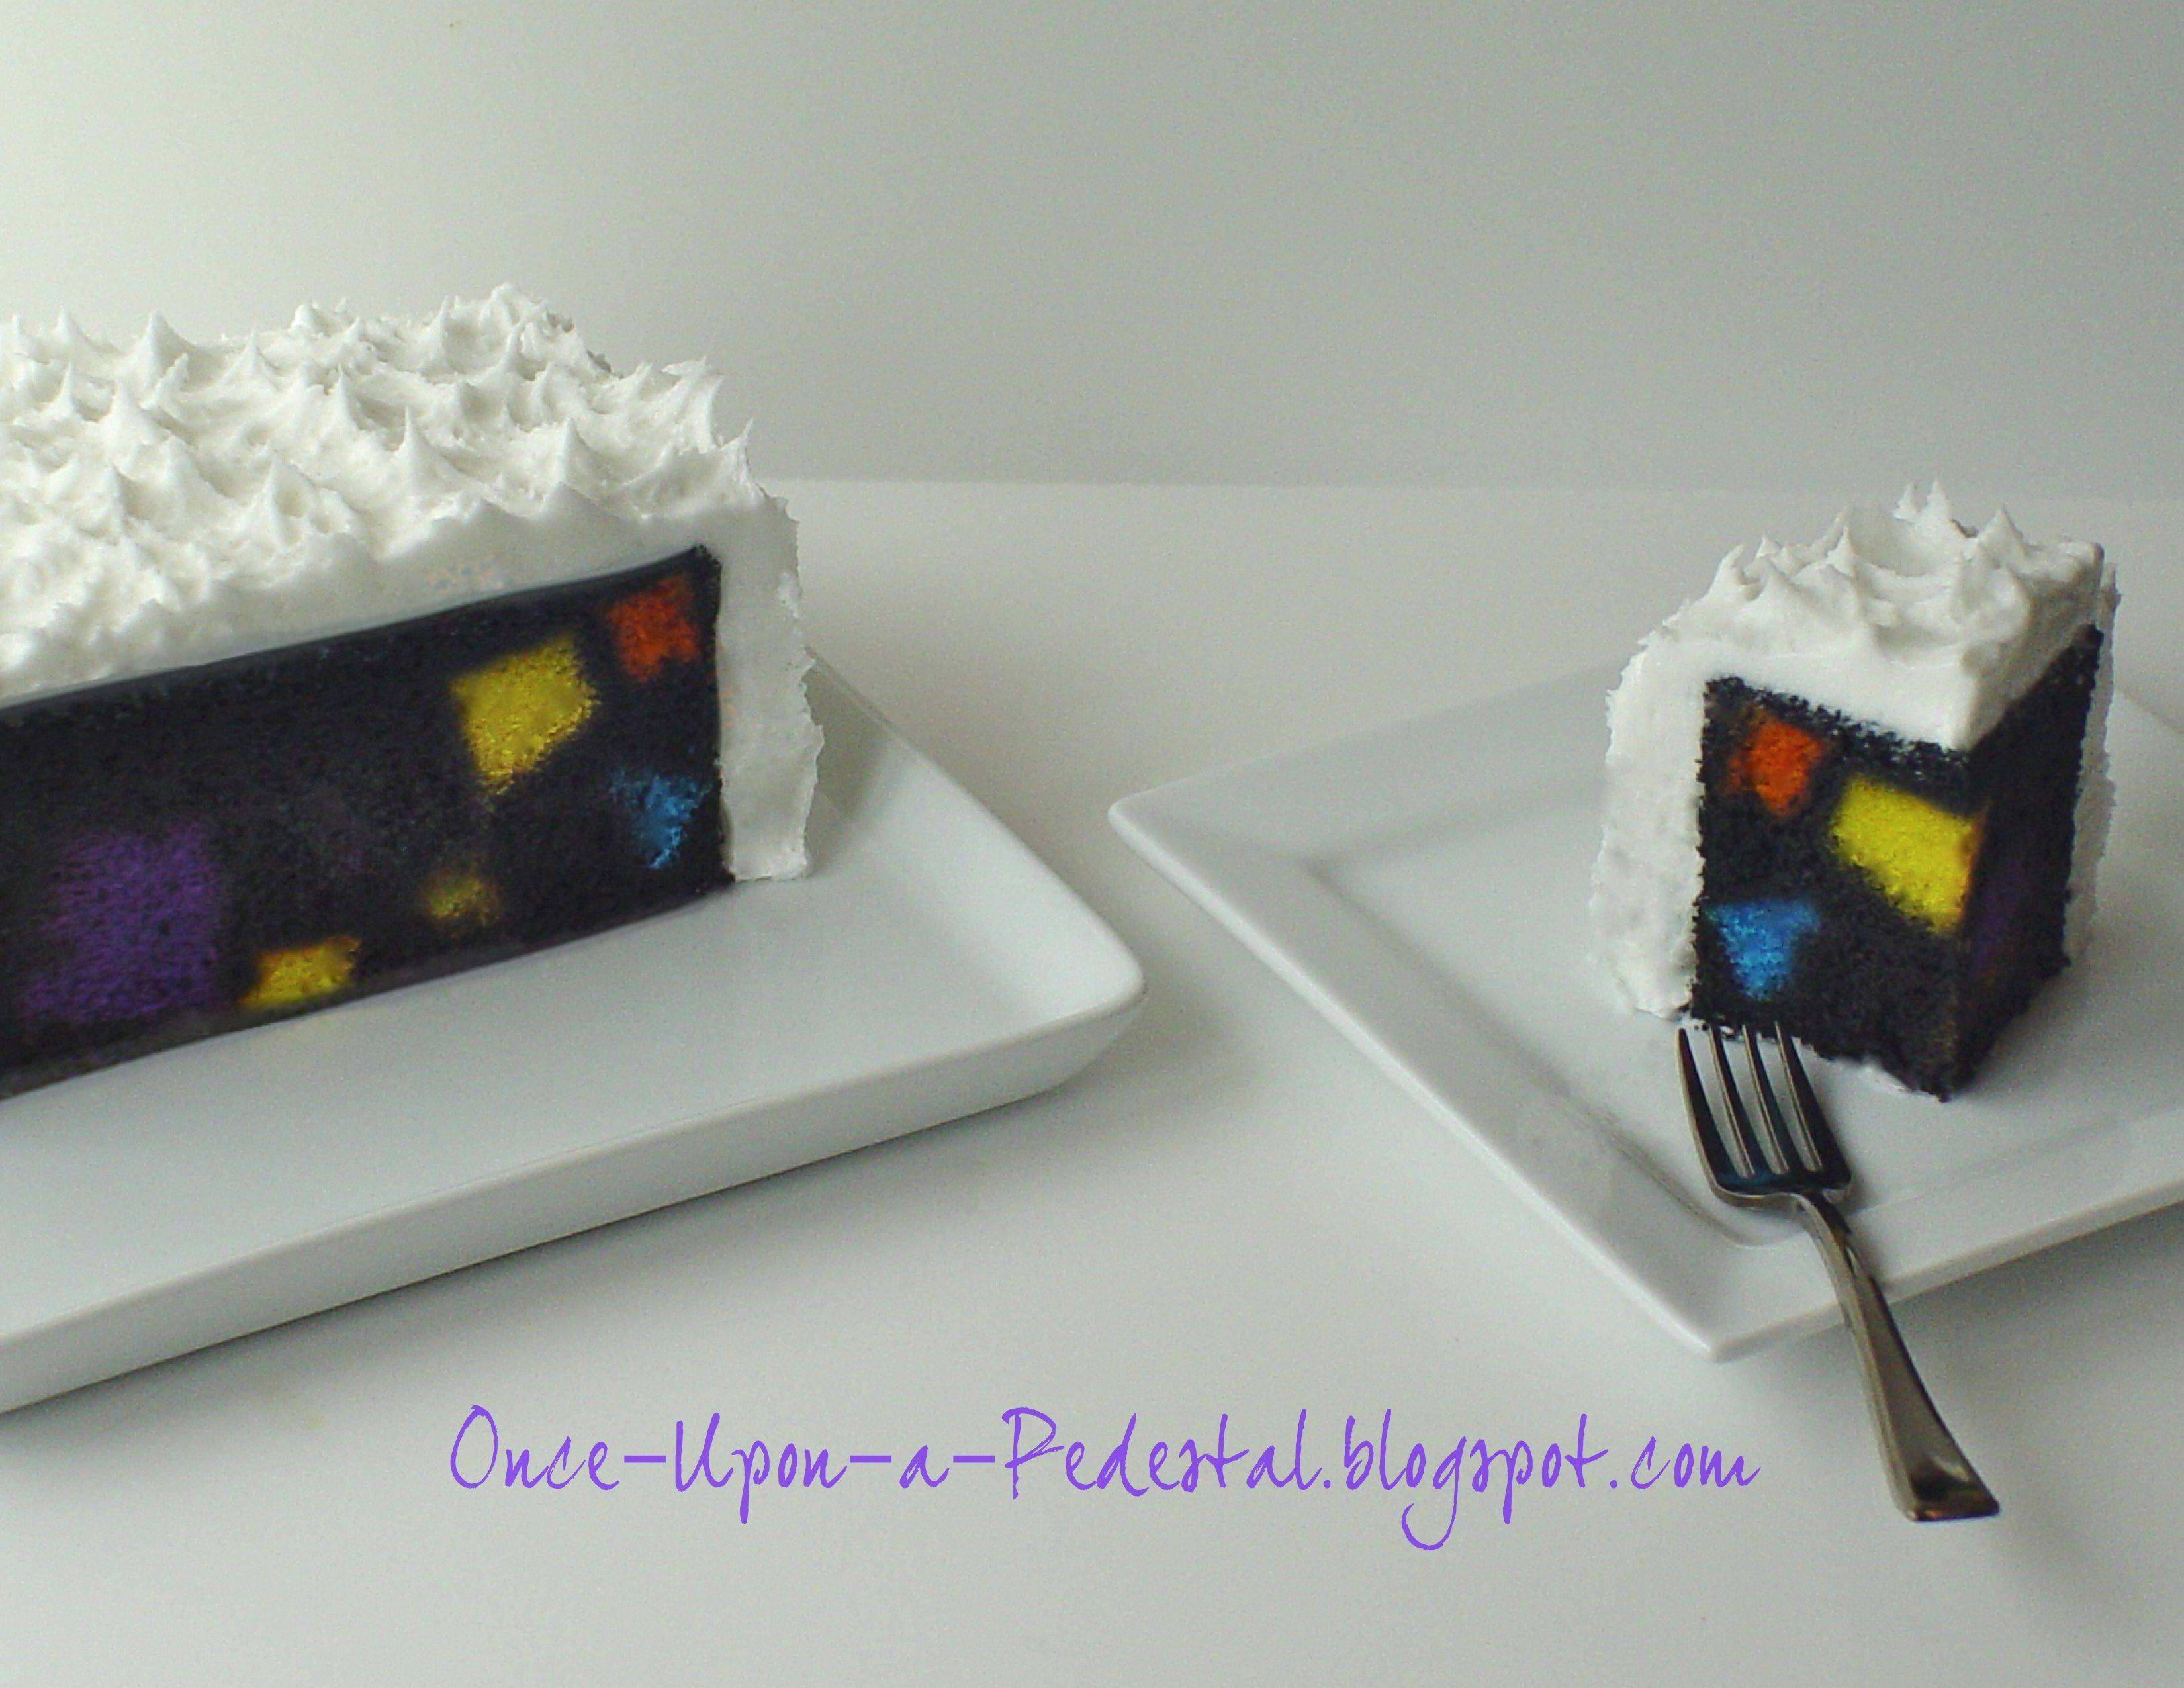 Twice baked cake. Cathedral window squares baked inside chocolate cake.